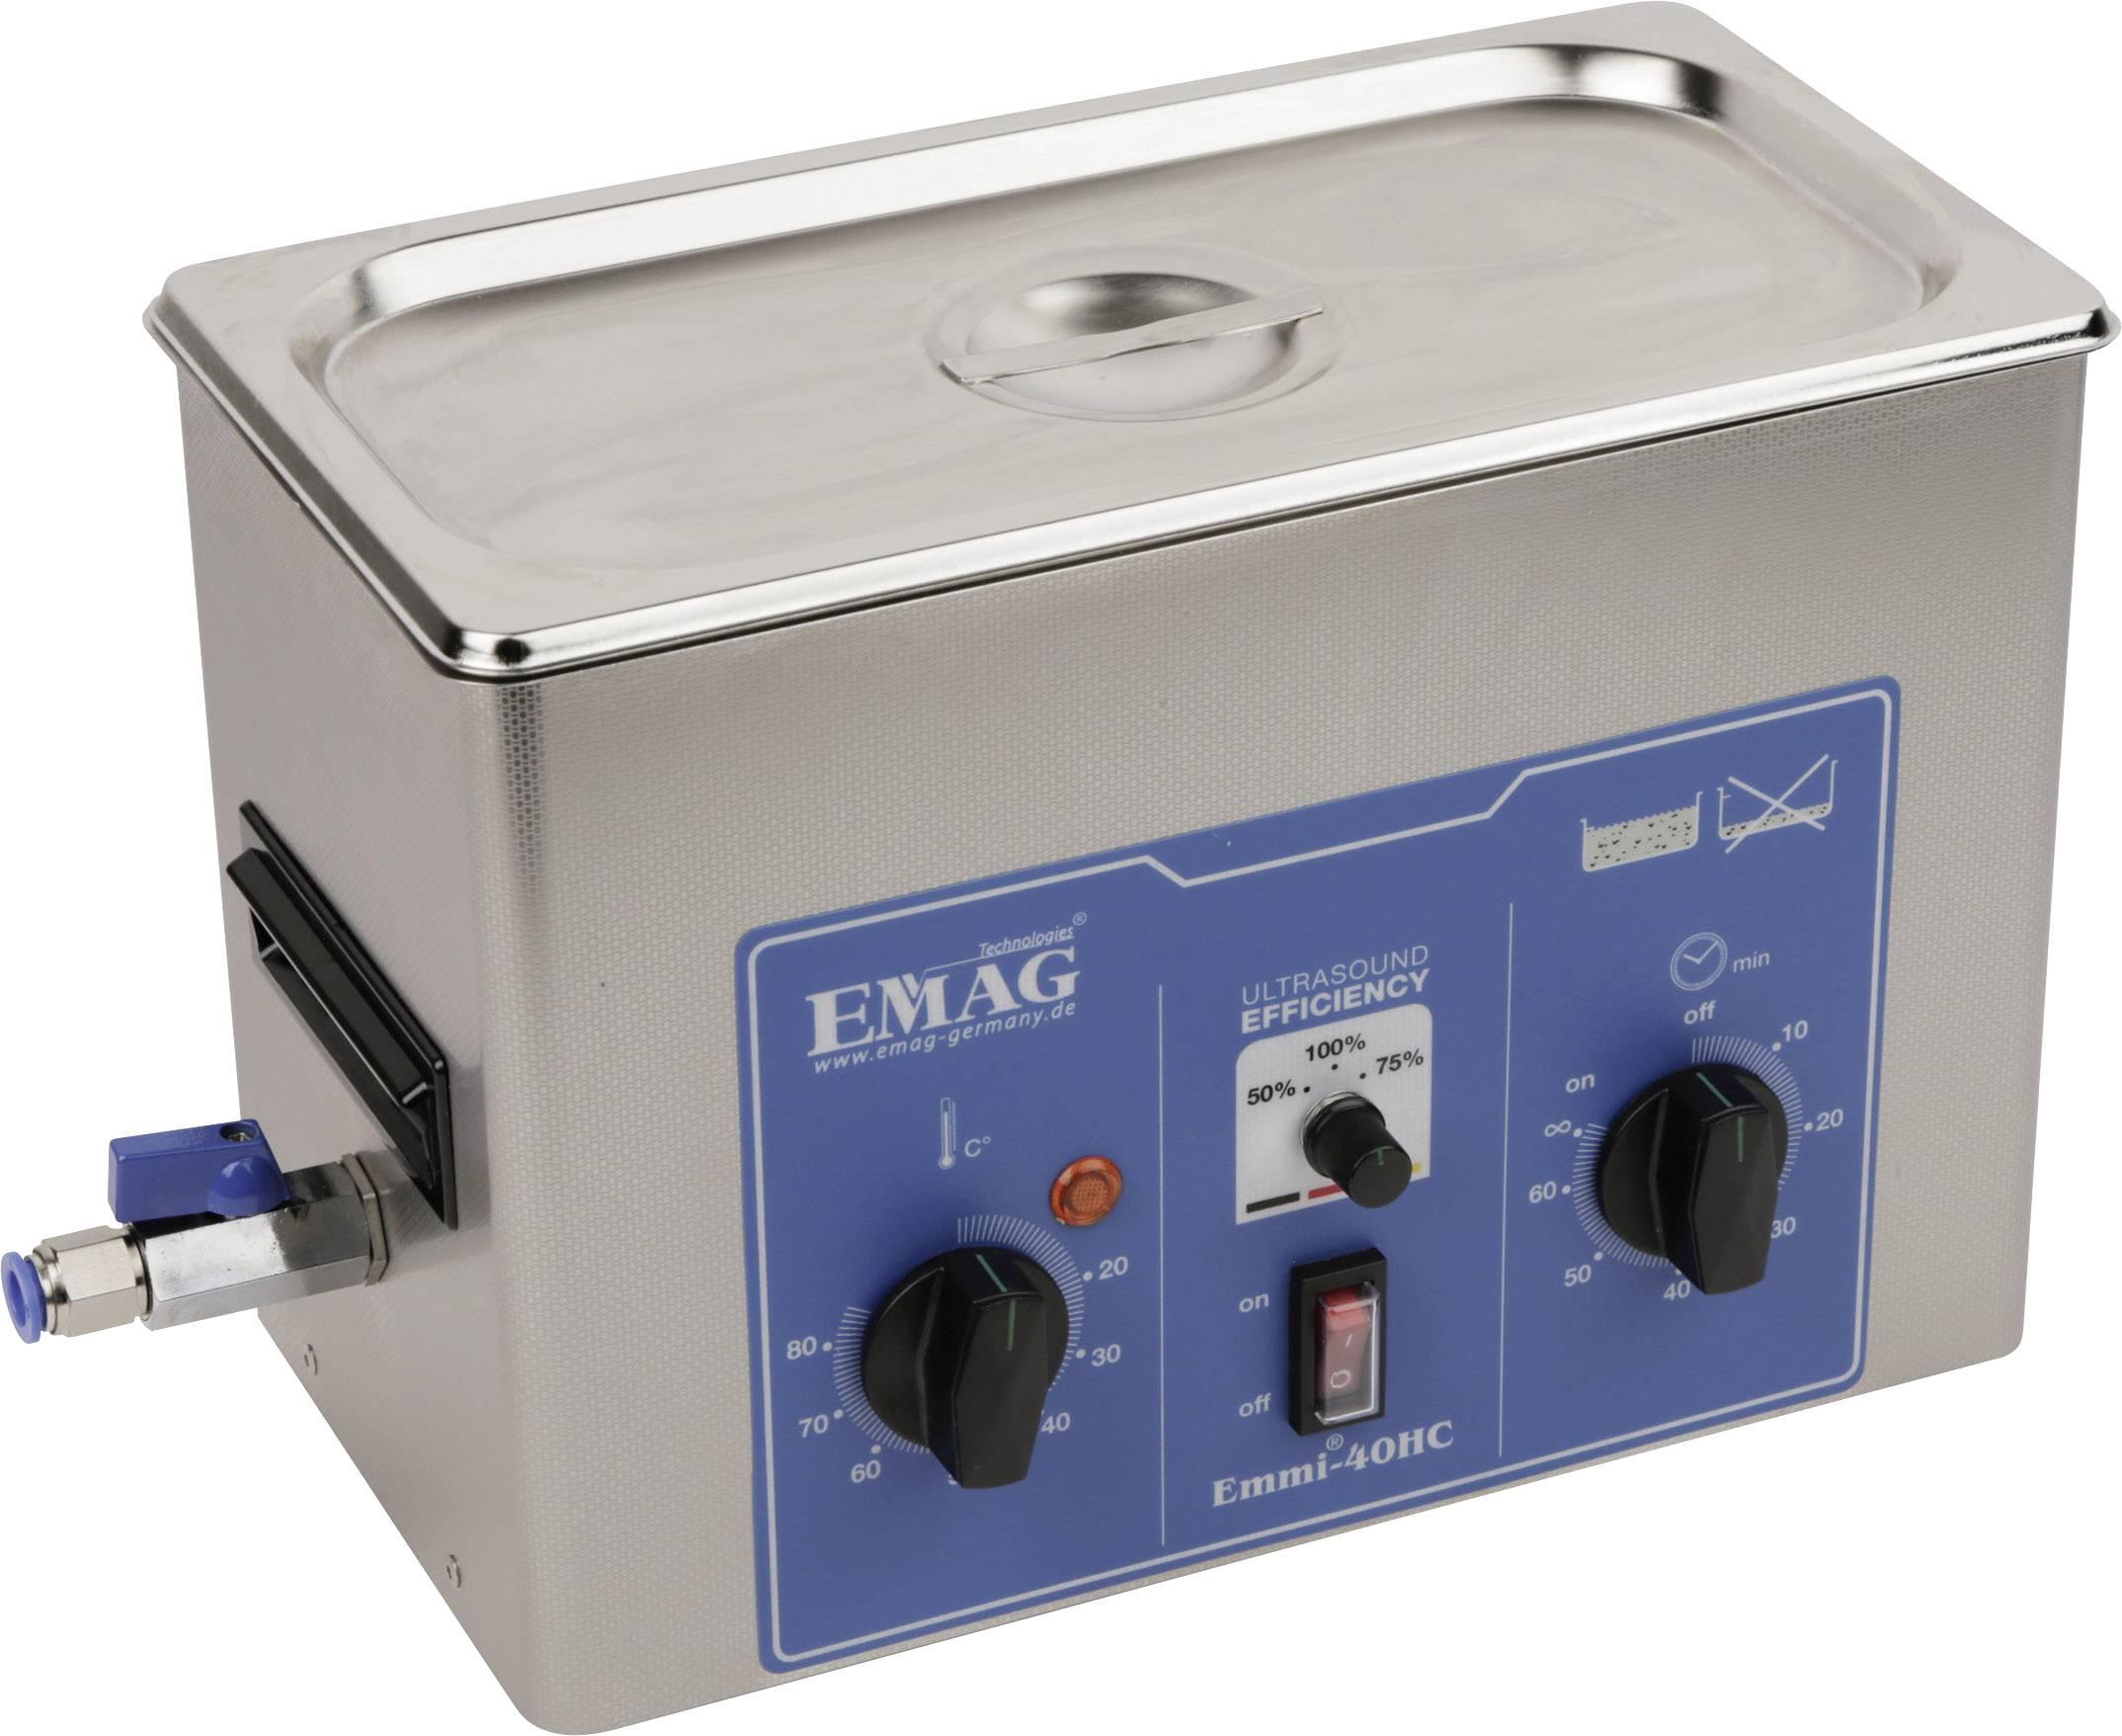 Ultrazvuková čistička Emag